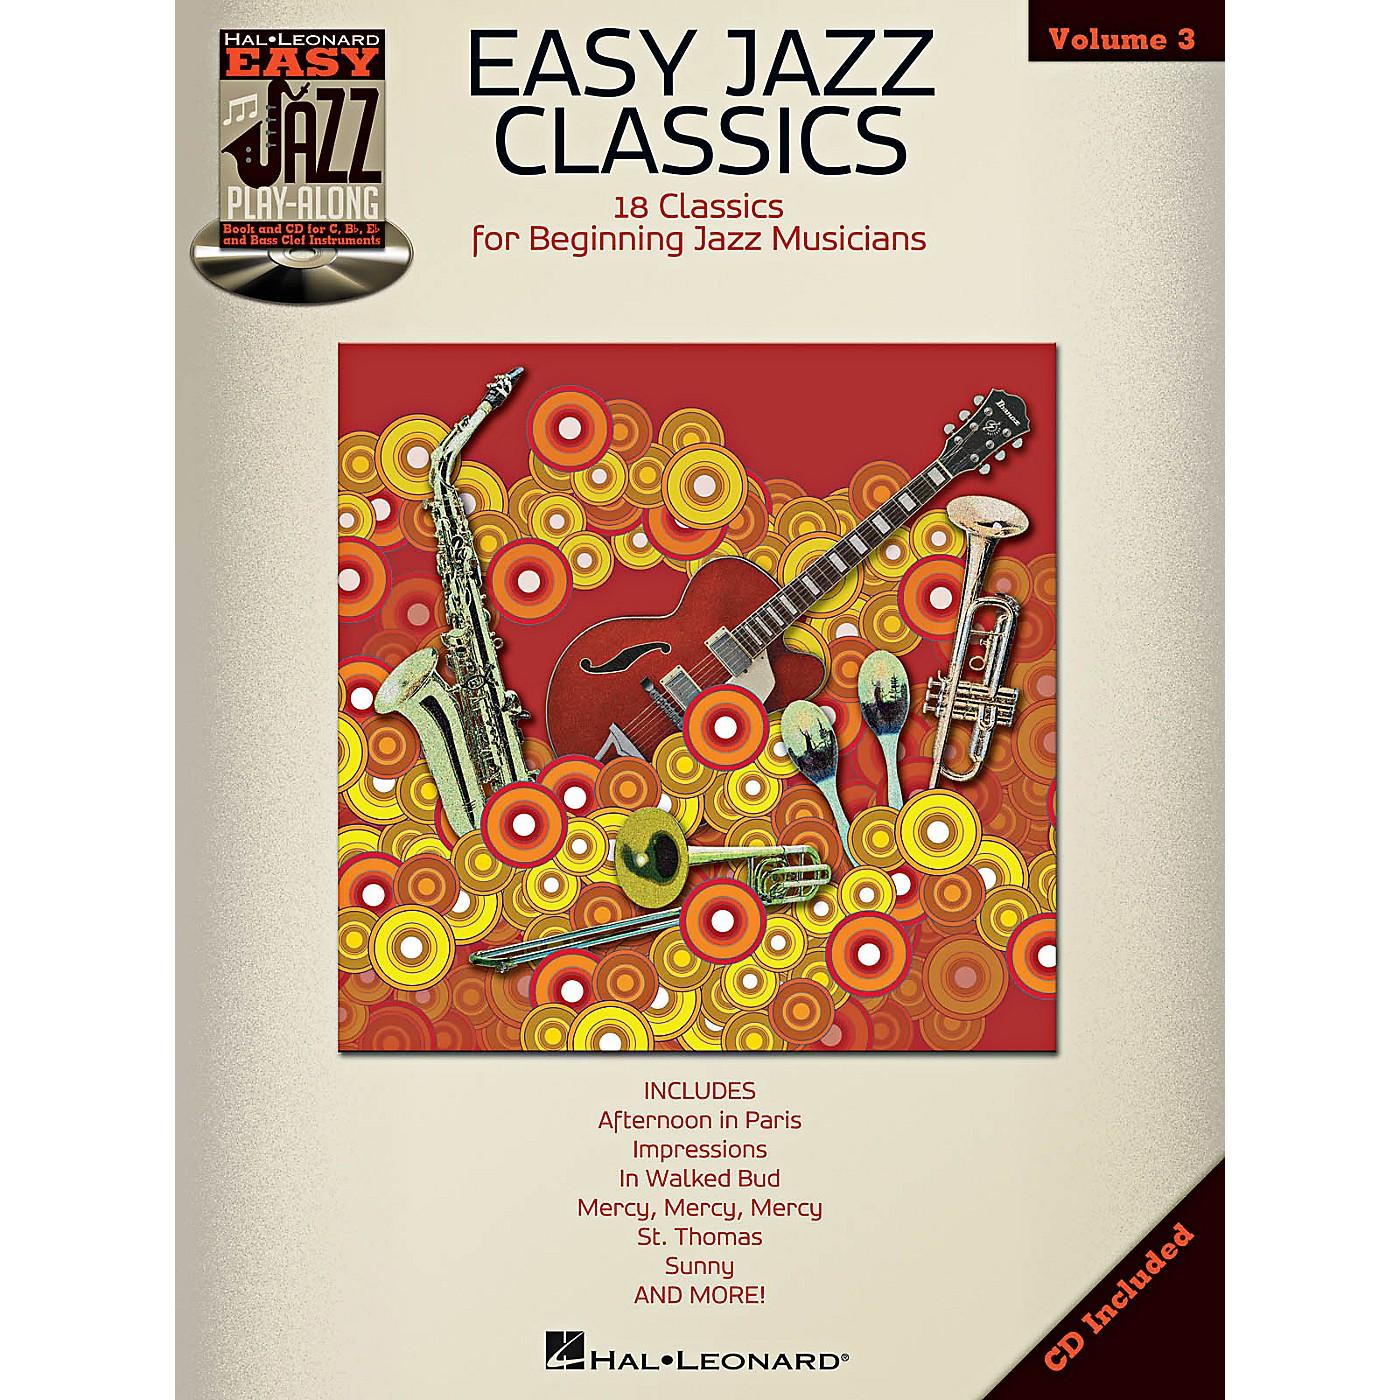 Hal Leonard Easy Jazz Classics - Easy Jazz Play-Along Vol. 3 Book/CD thumbnail